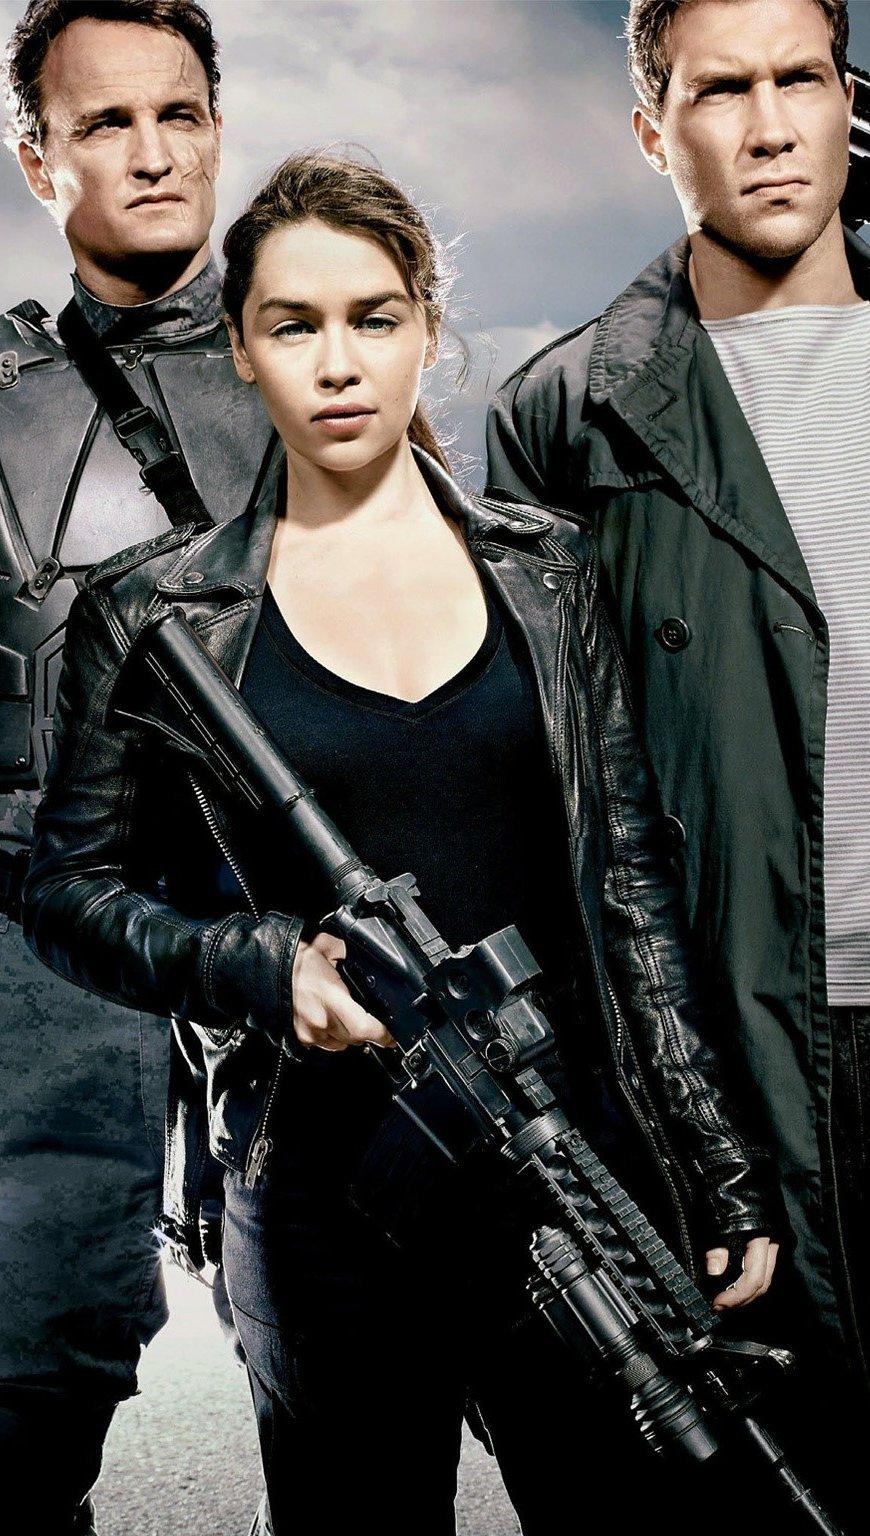 Fondos de pantalla Terminator: Genesis Vertical